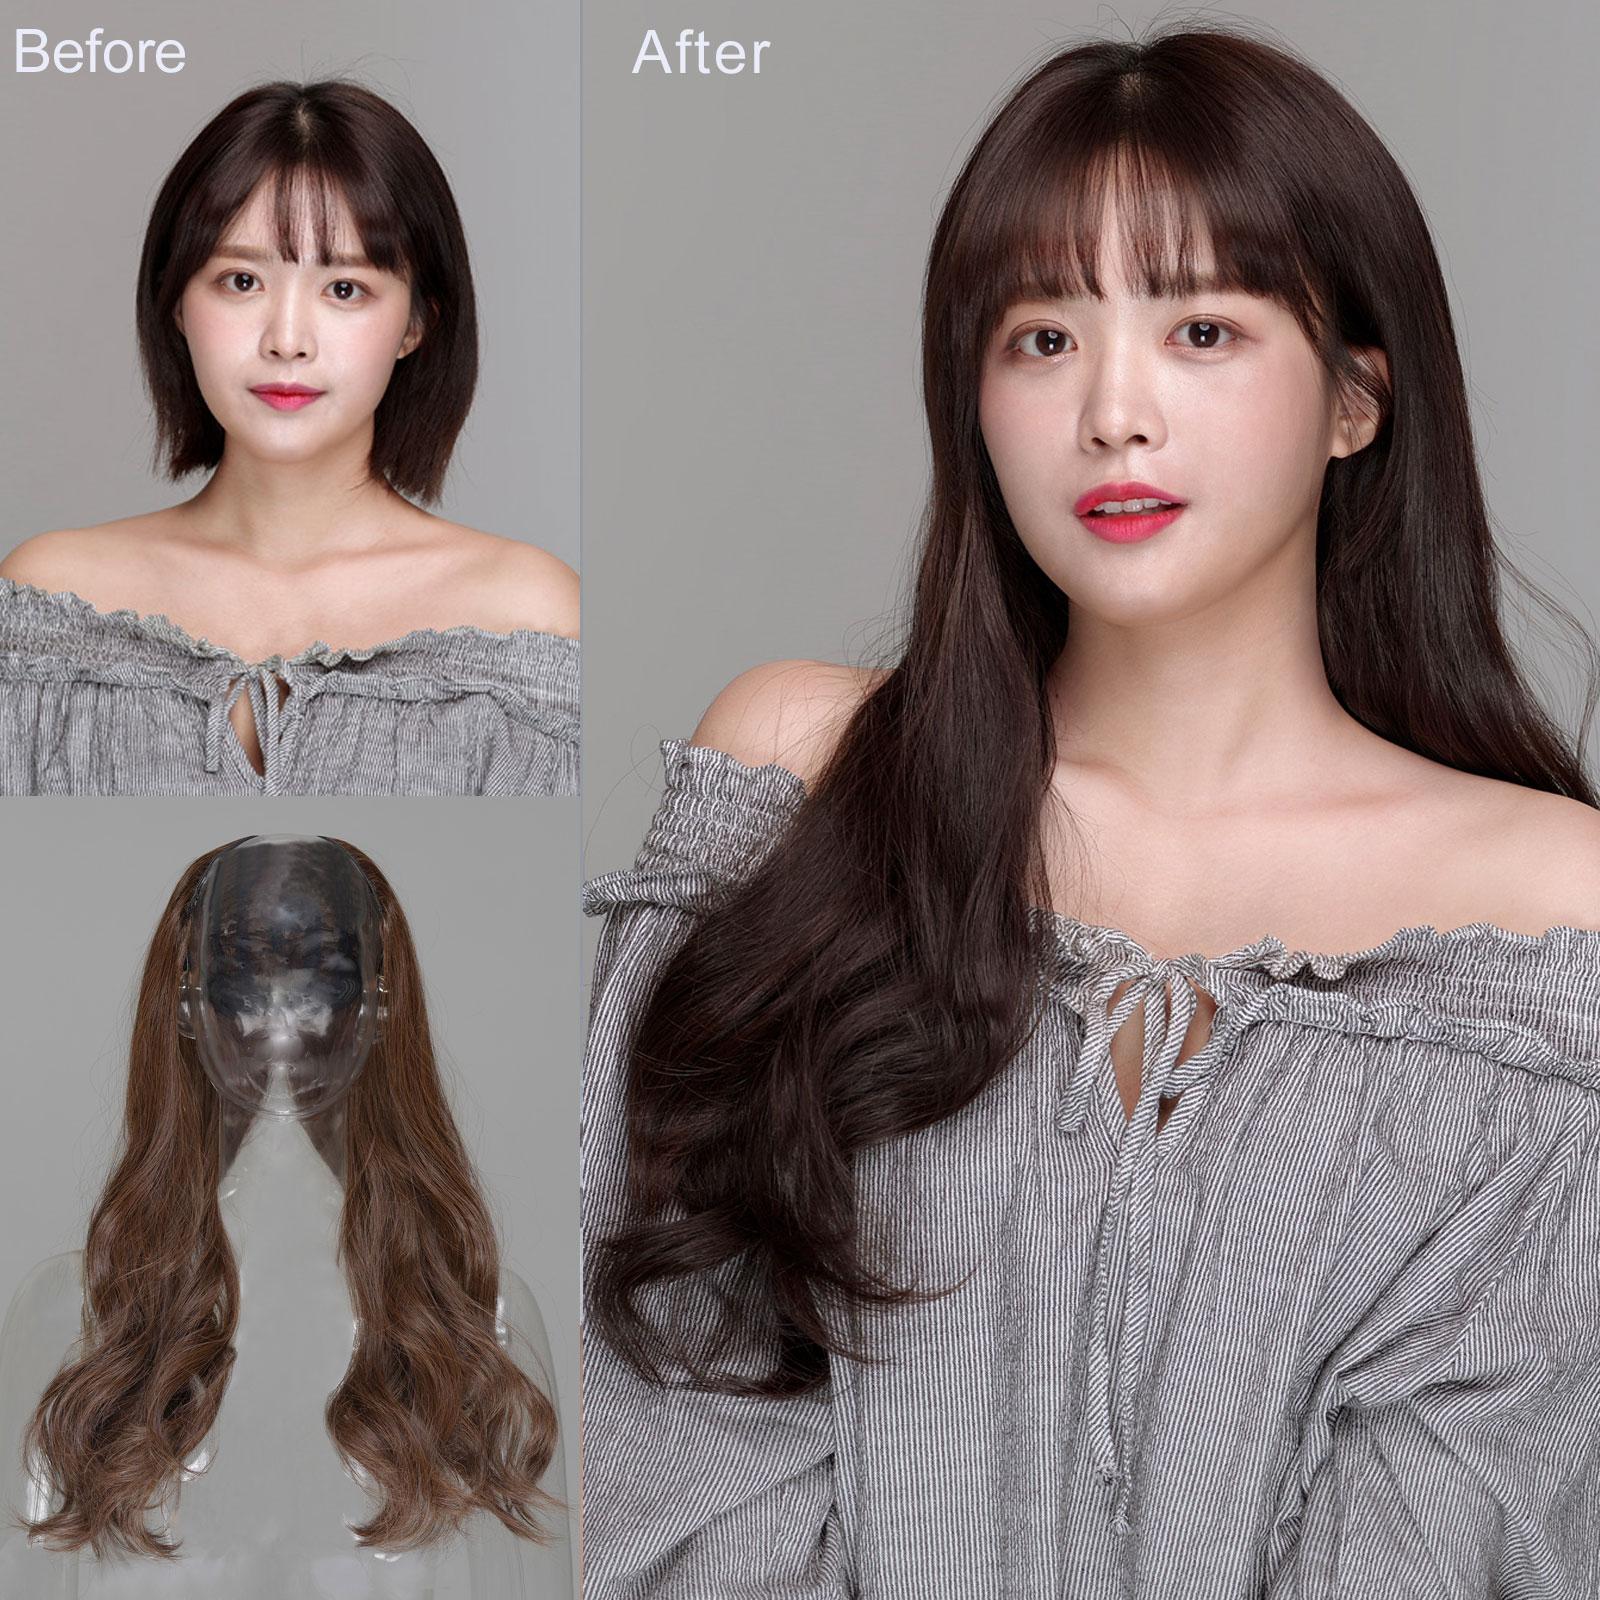 <br/><br/> 全新設計U型半罩式假髮 韓系浪漫大捲長髮 逼真自然【MW356】☆雙兒網☆<br/><br/>